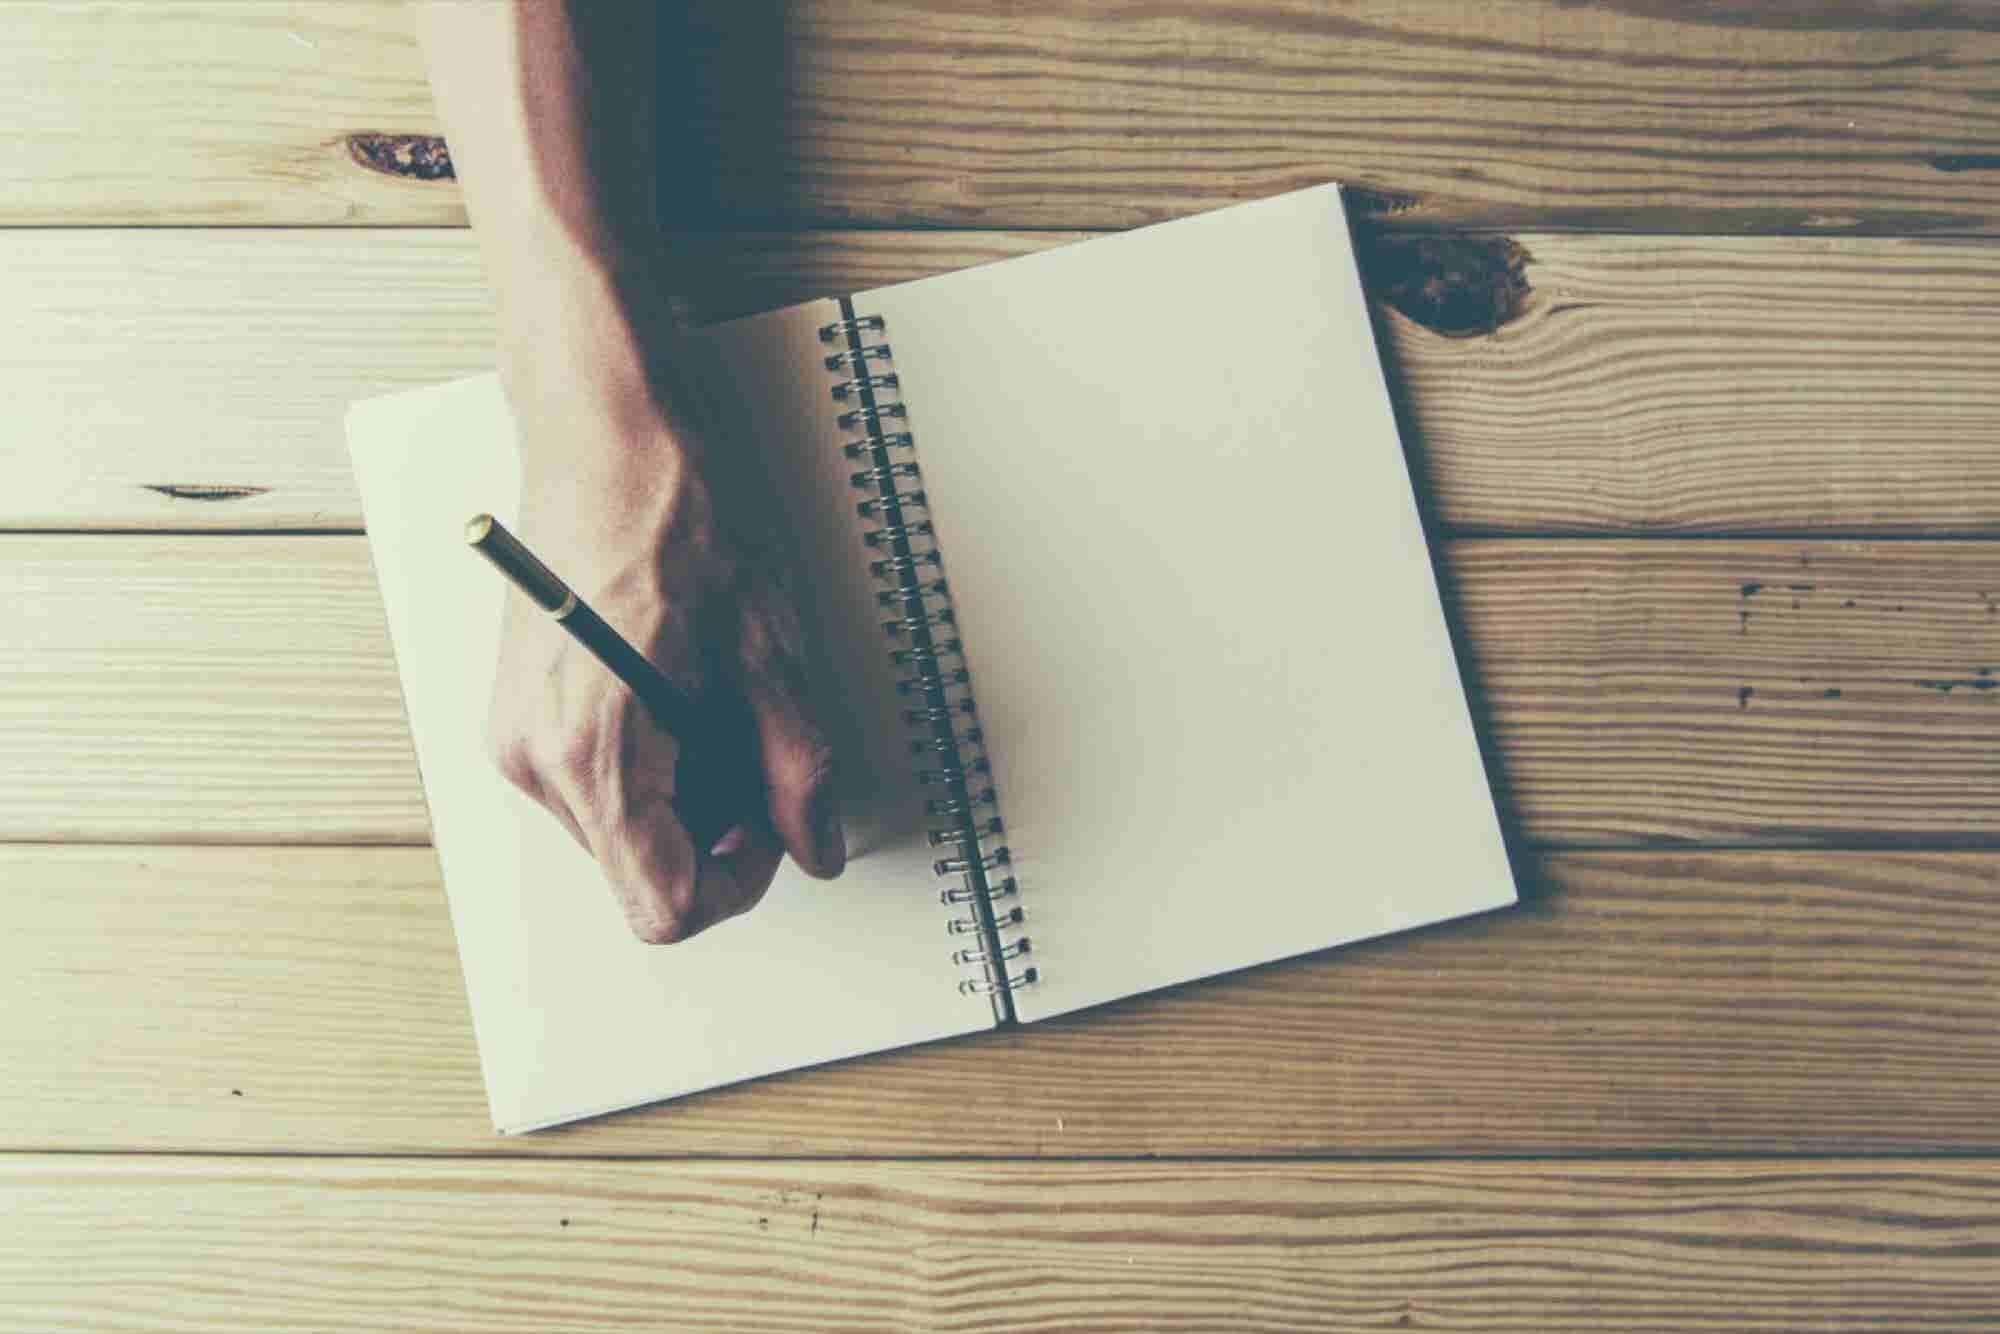 9 Ways High-Performing Entrepreneurs Handle Stress